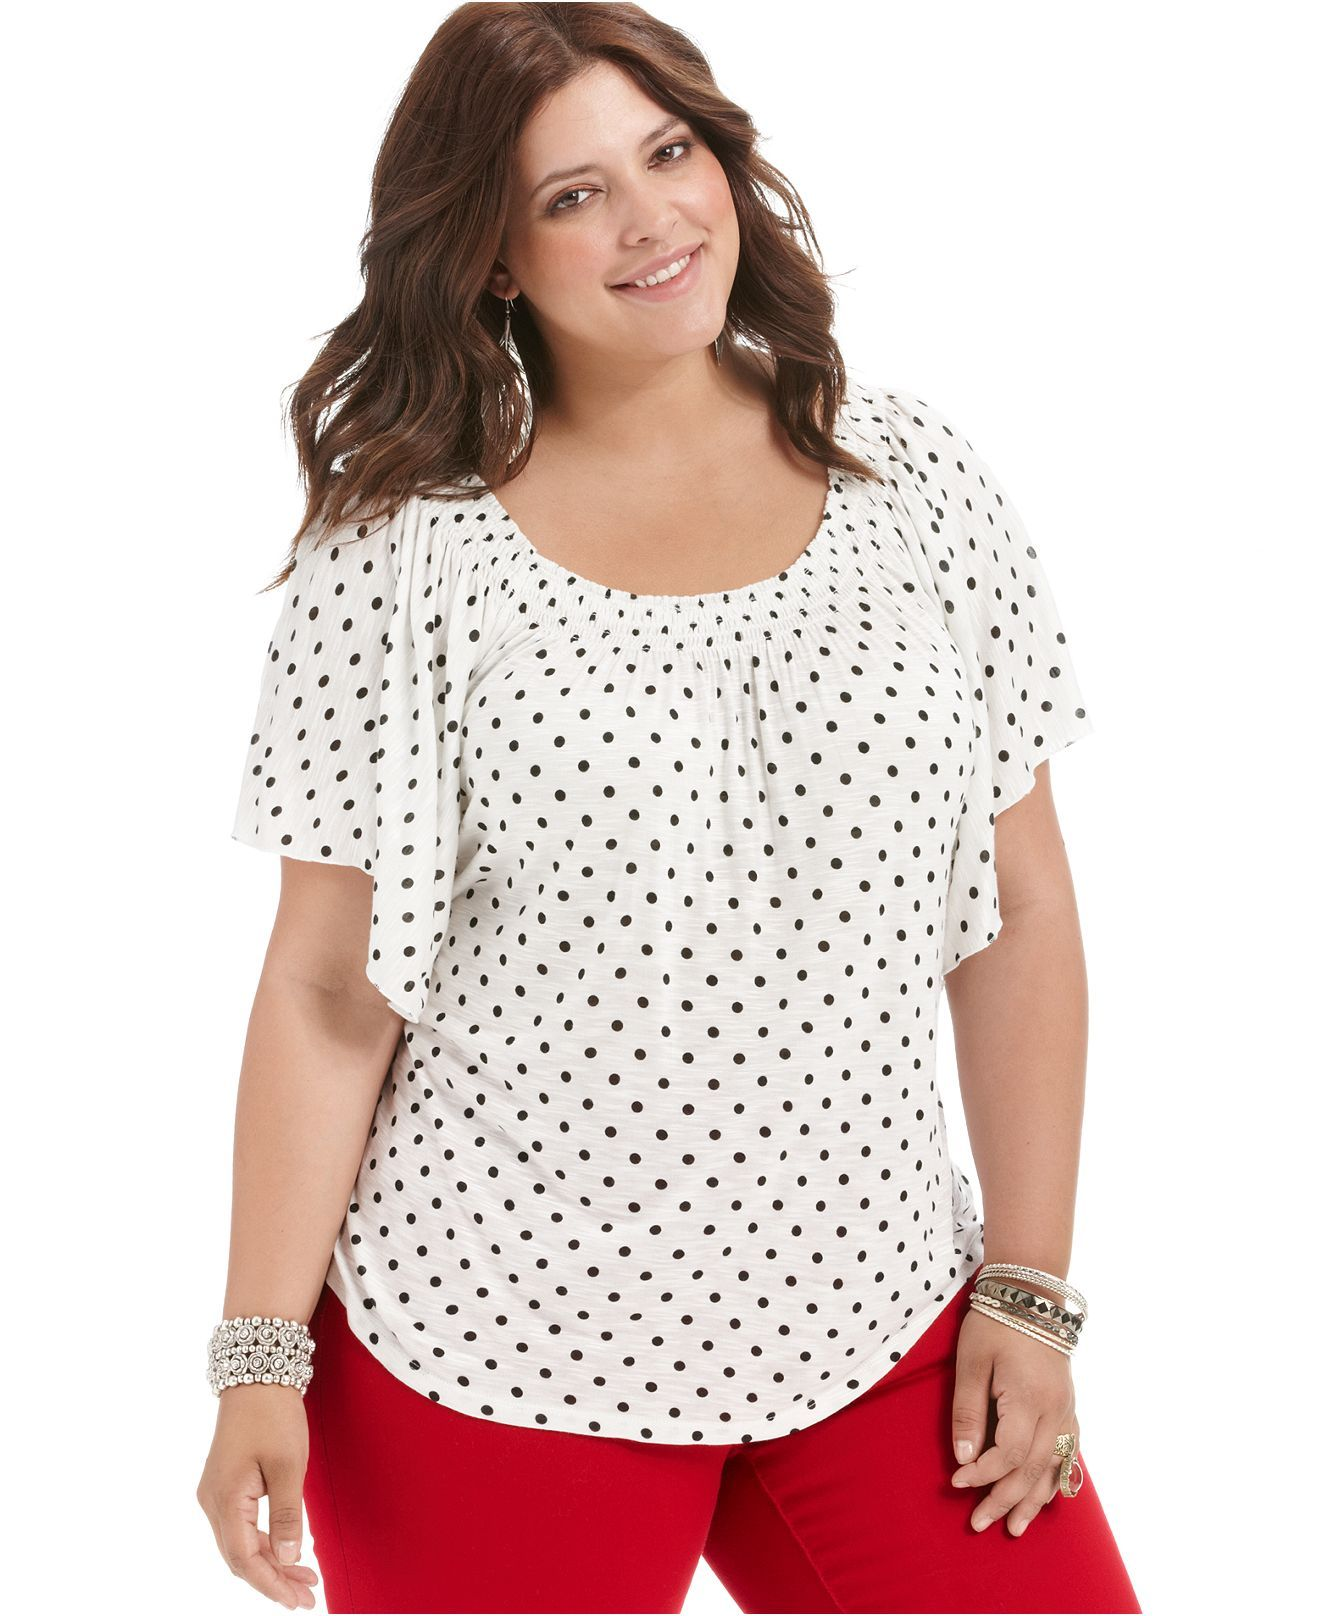 a2d20454 American Rag Plus Size Top, Short-Sleeve Polka-Dot - Plus Size Tops - Plus  Sizes - Macy's